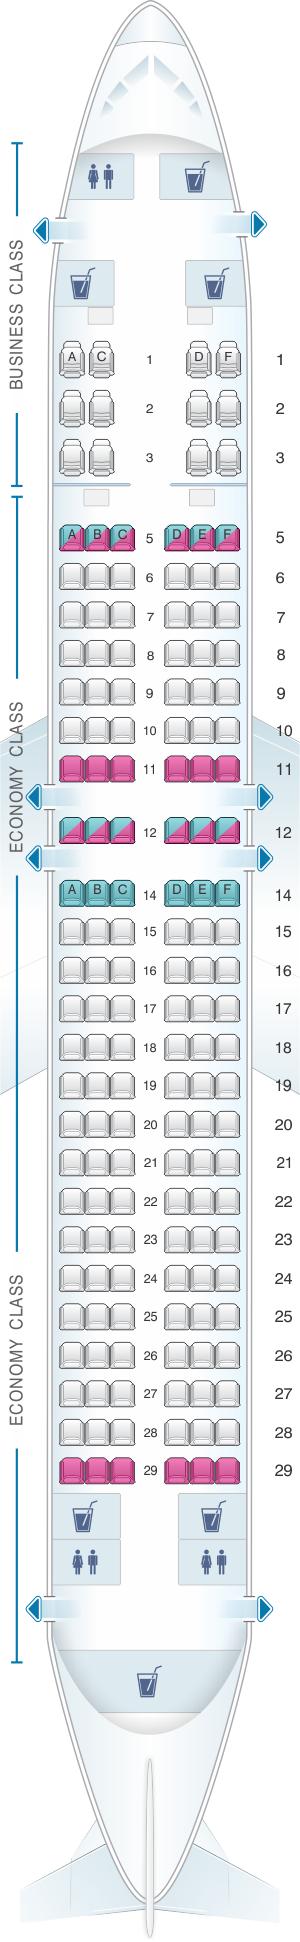 Seat map for SilkAir Boeing B737 800 Max 8